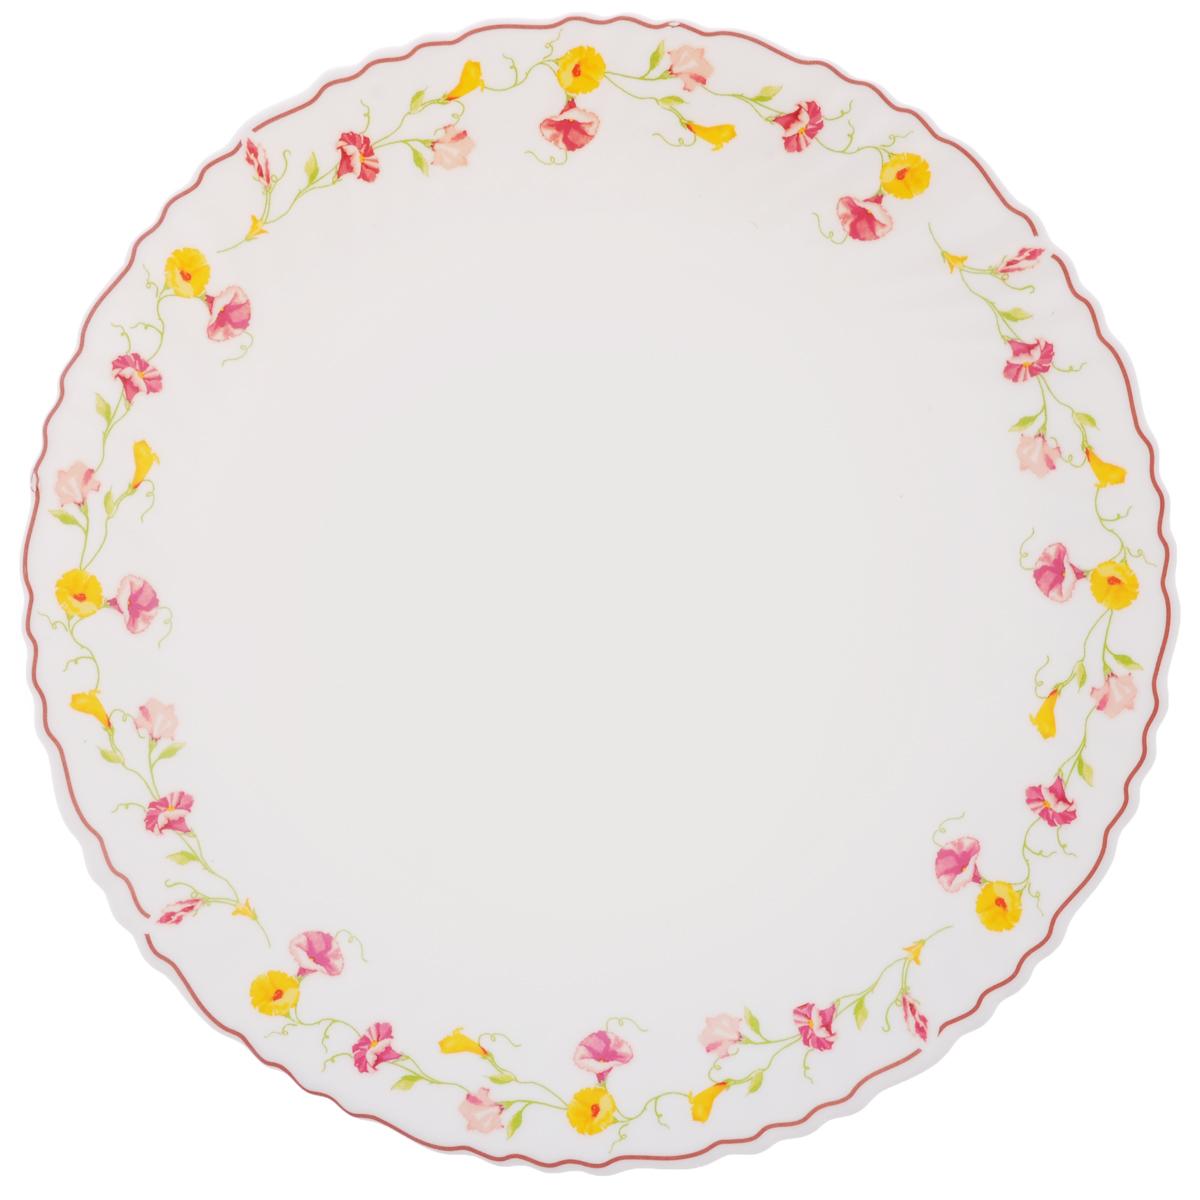 Тарелка обеденная Chinbull Эльзас, диаметр 24 см блюдо chinbull классик 25 см х 17 см